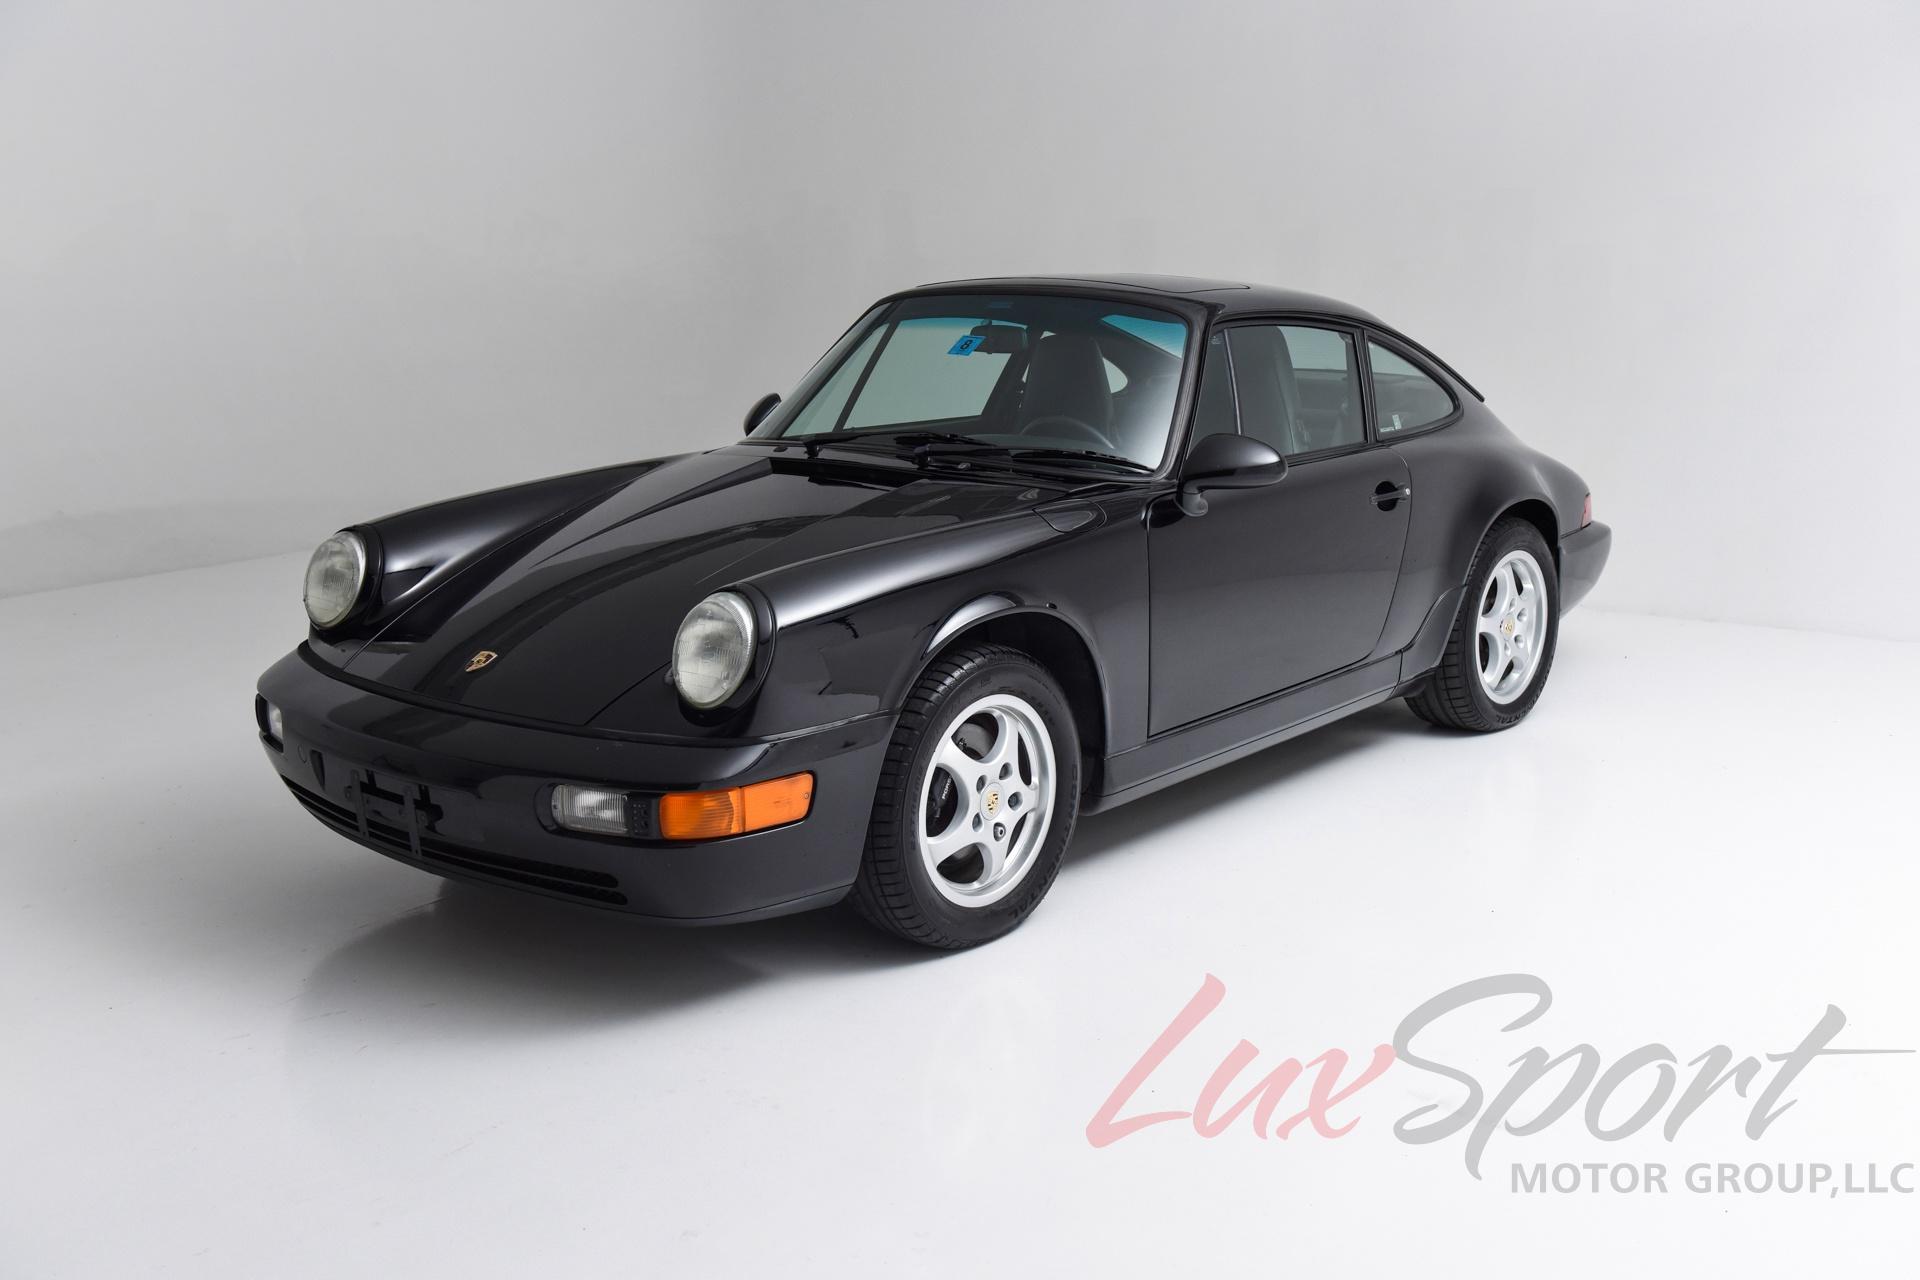 Used 1992 Porsche 964 Carrera 4 Coupe New Hyde Park Ny